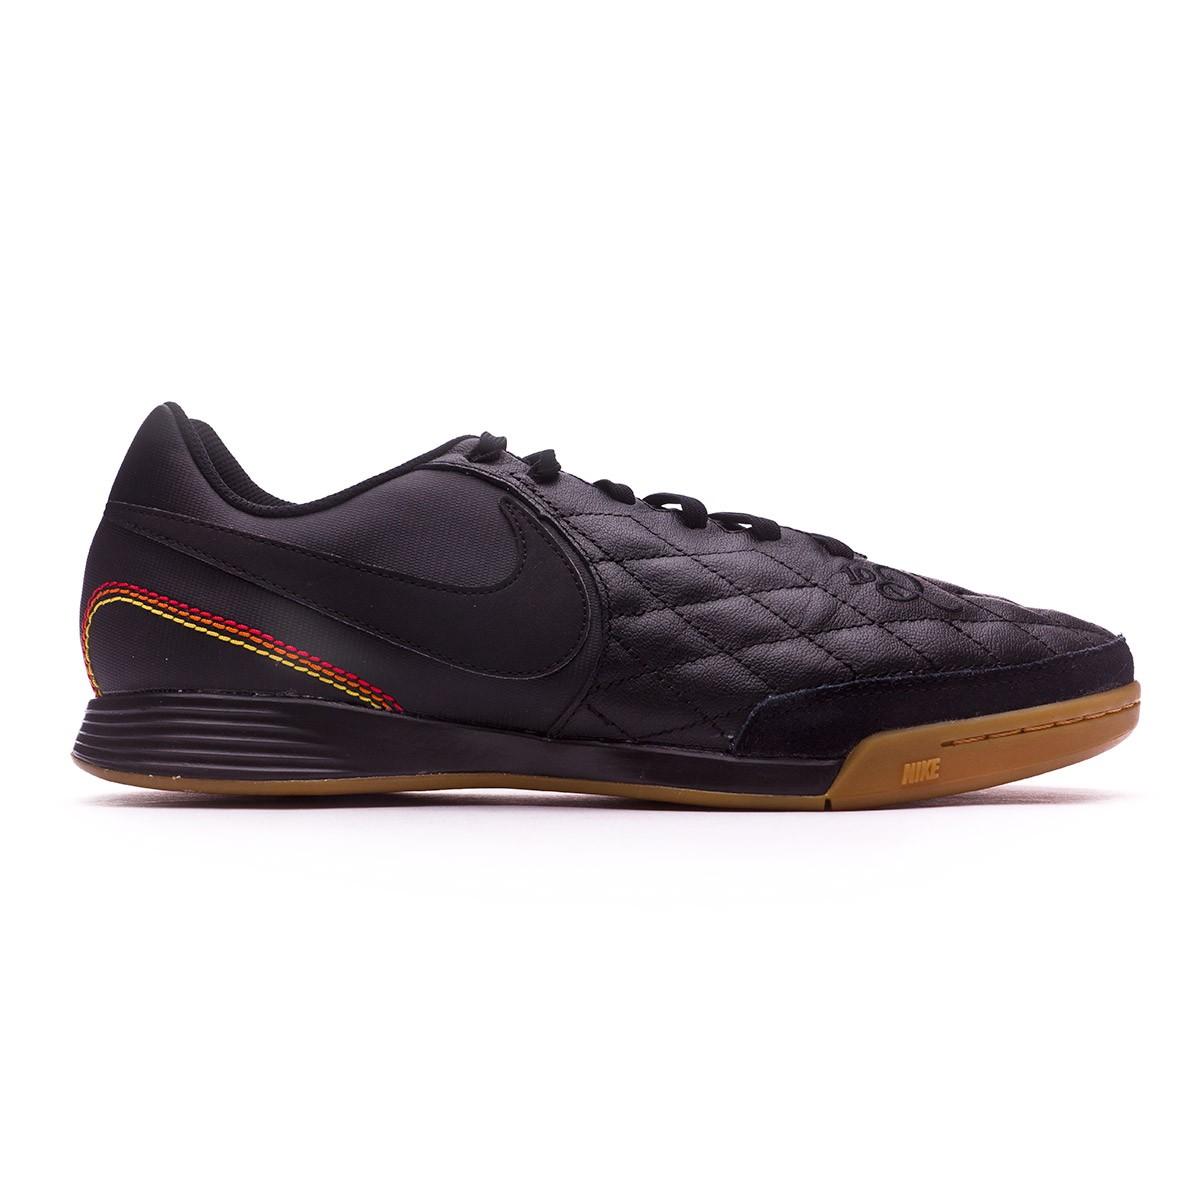 3af7dd590 Futsal Boot Nike TiempoX Ligera IV 10R Paris IC Black-Metallic gold -  Football store Fútbol Emotion